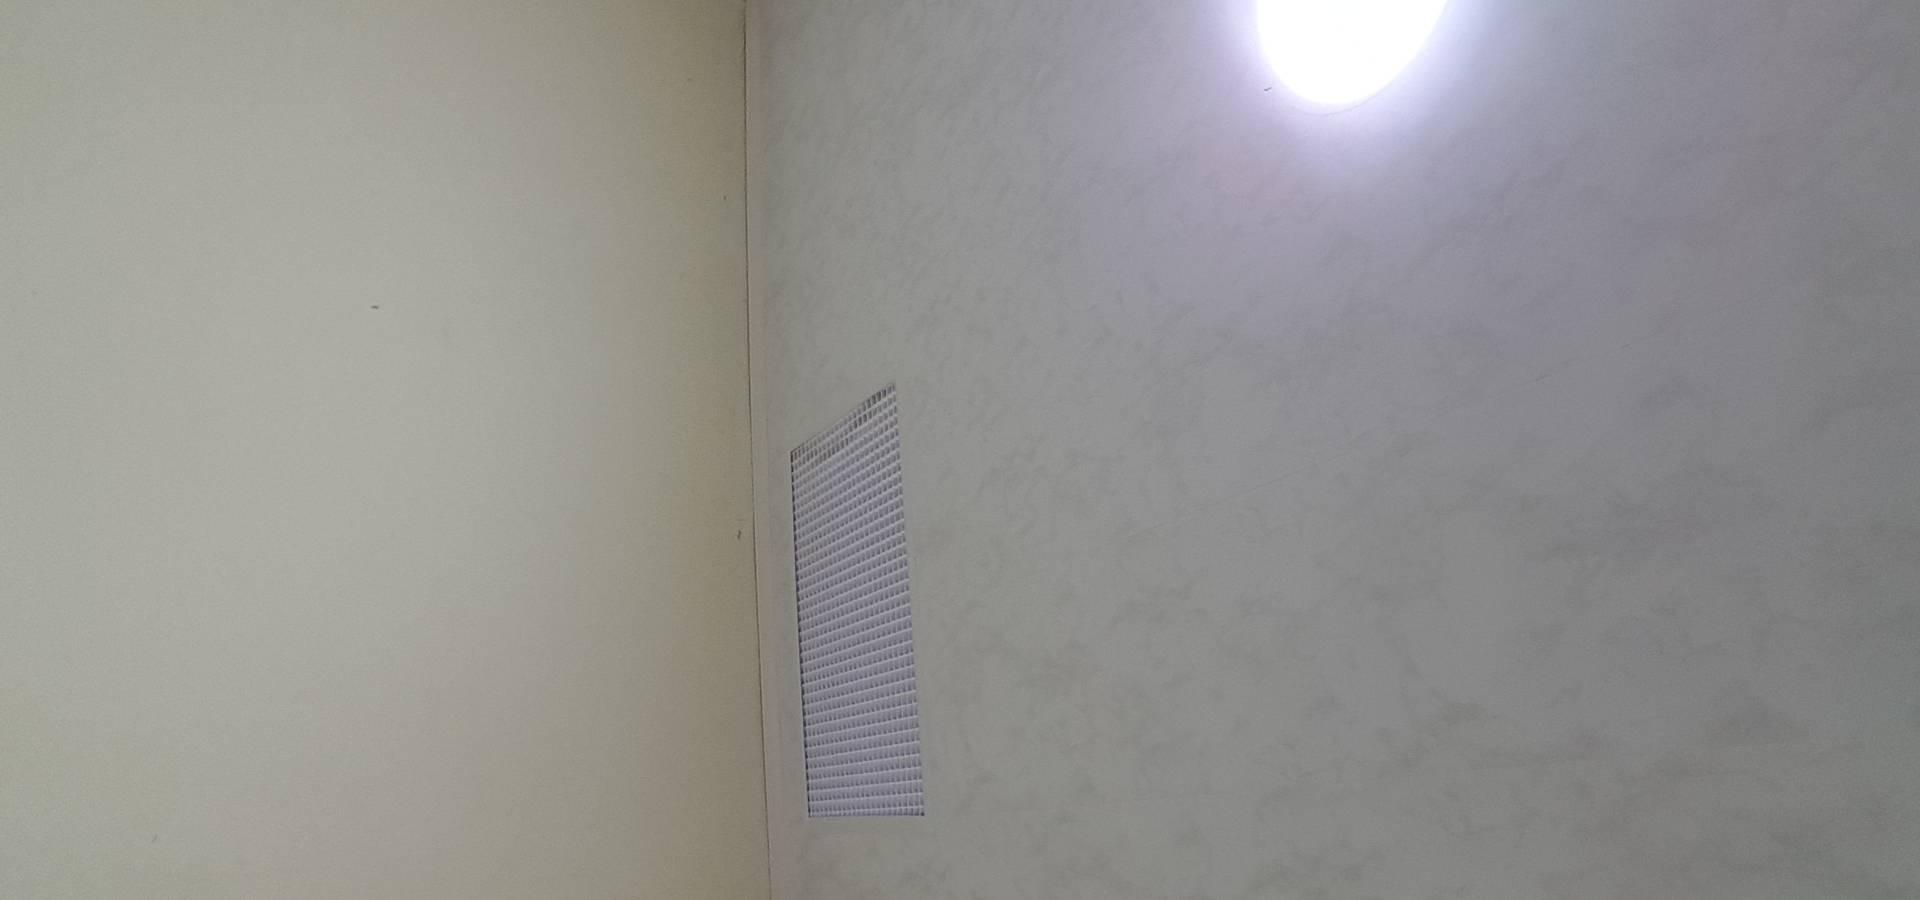 Deck pisos